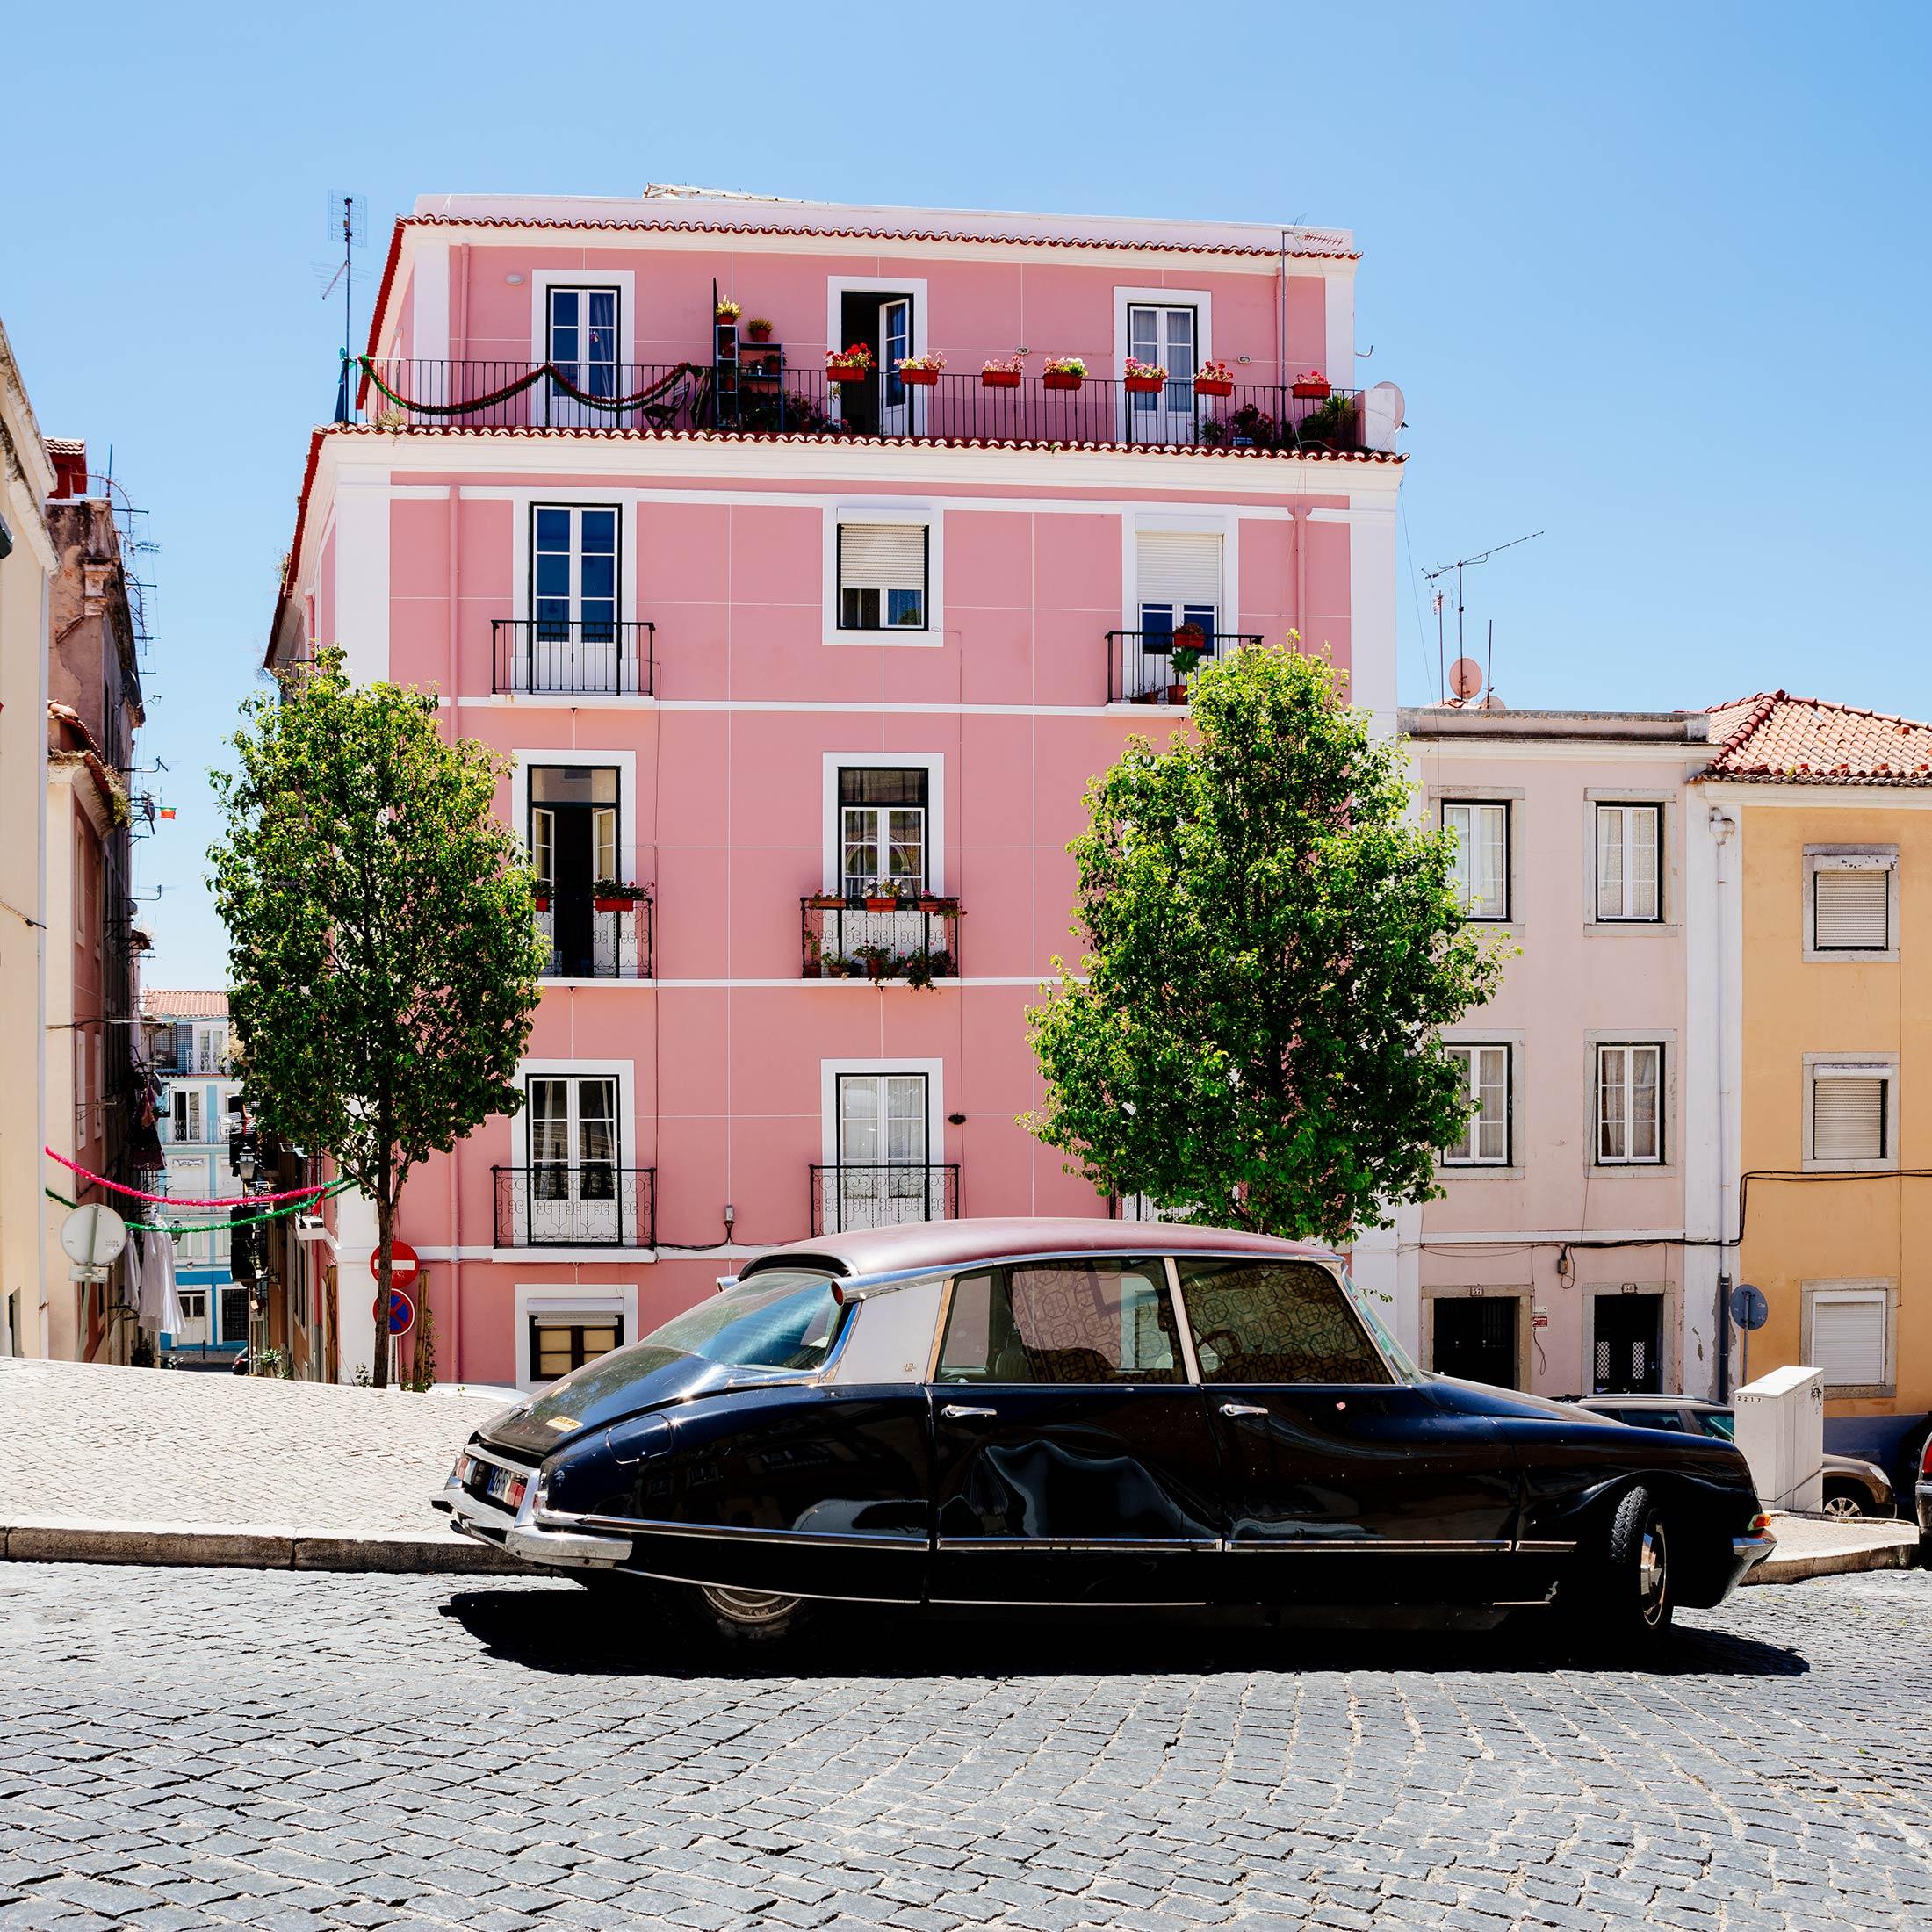 LIS_Lissabon_07-Mitja_Schneehage